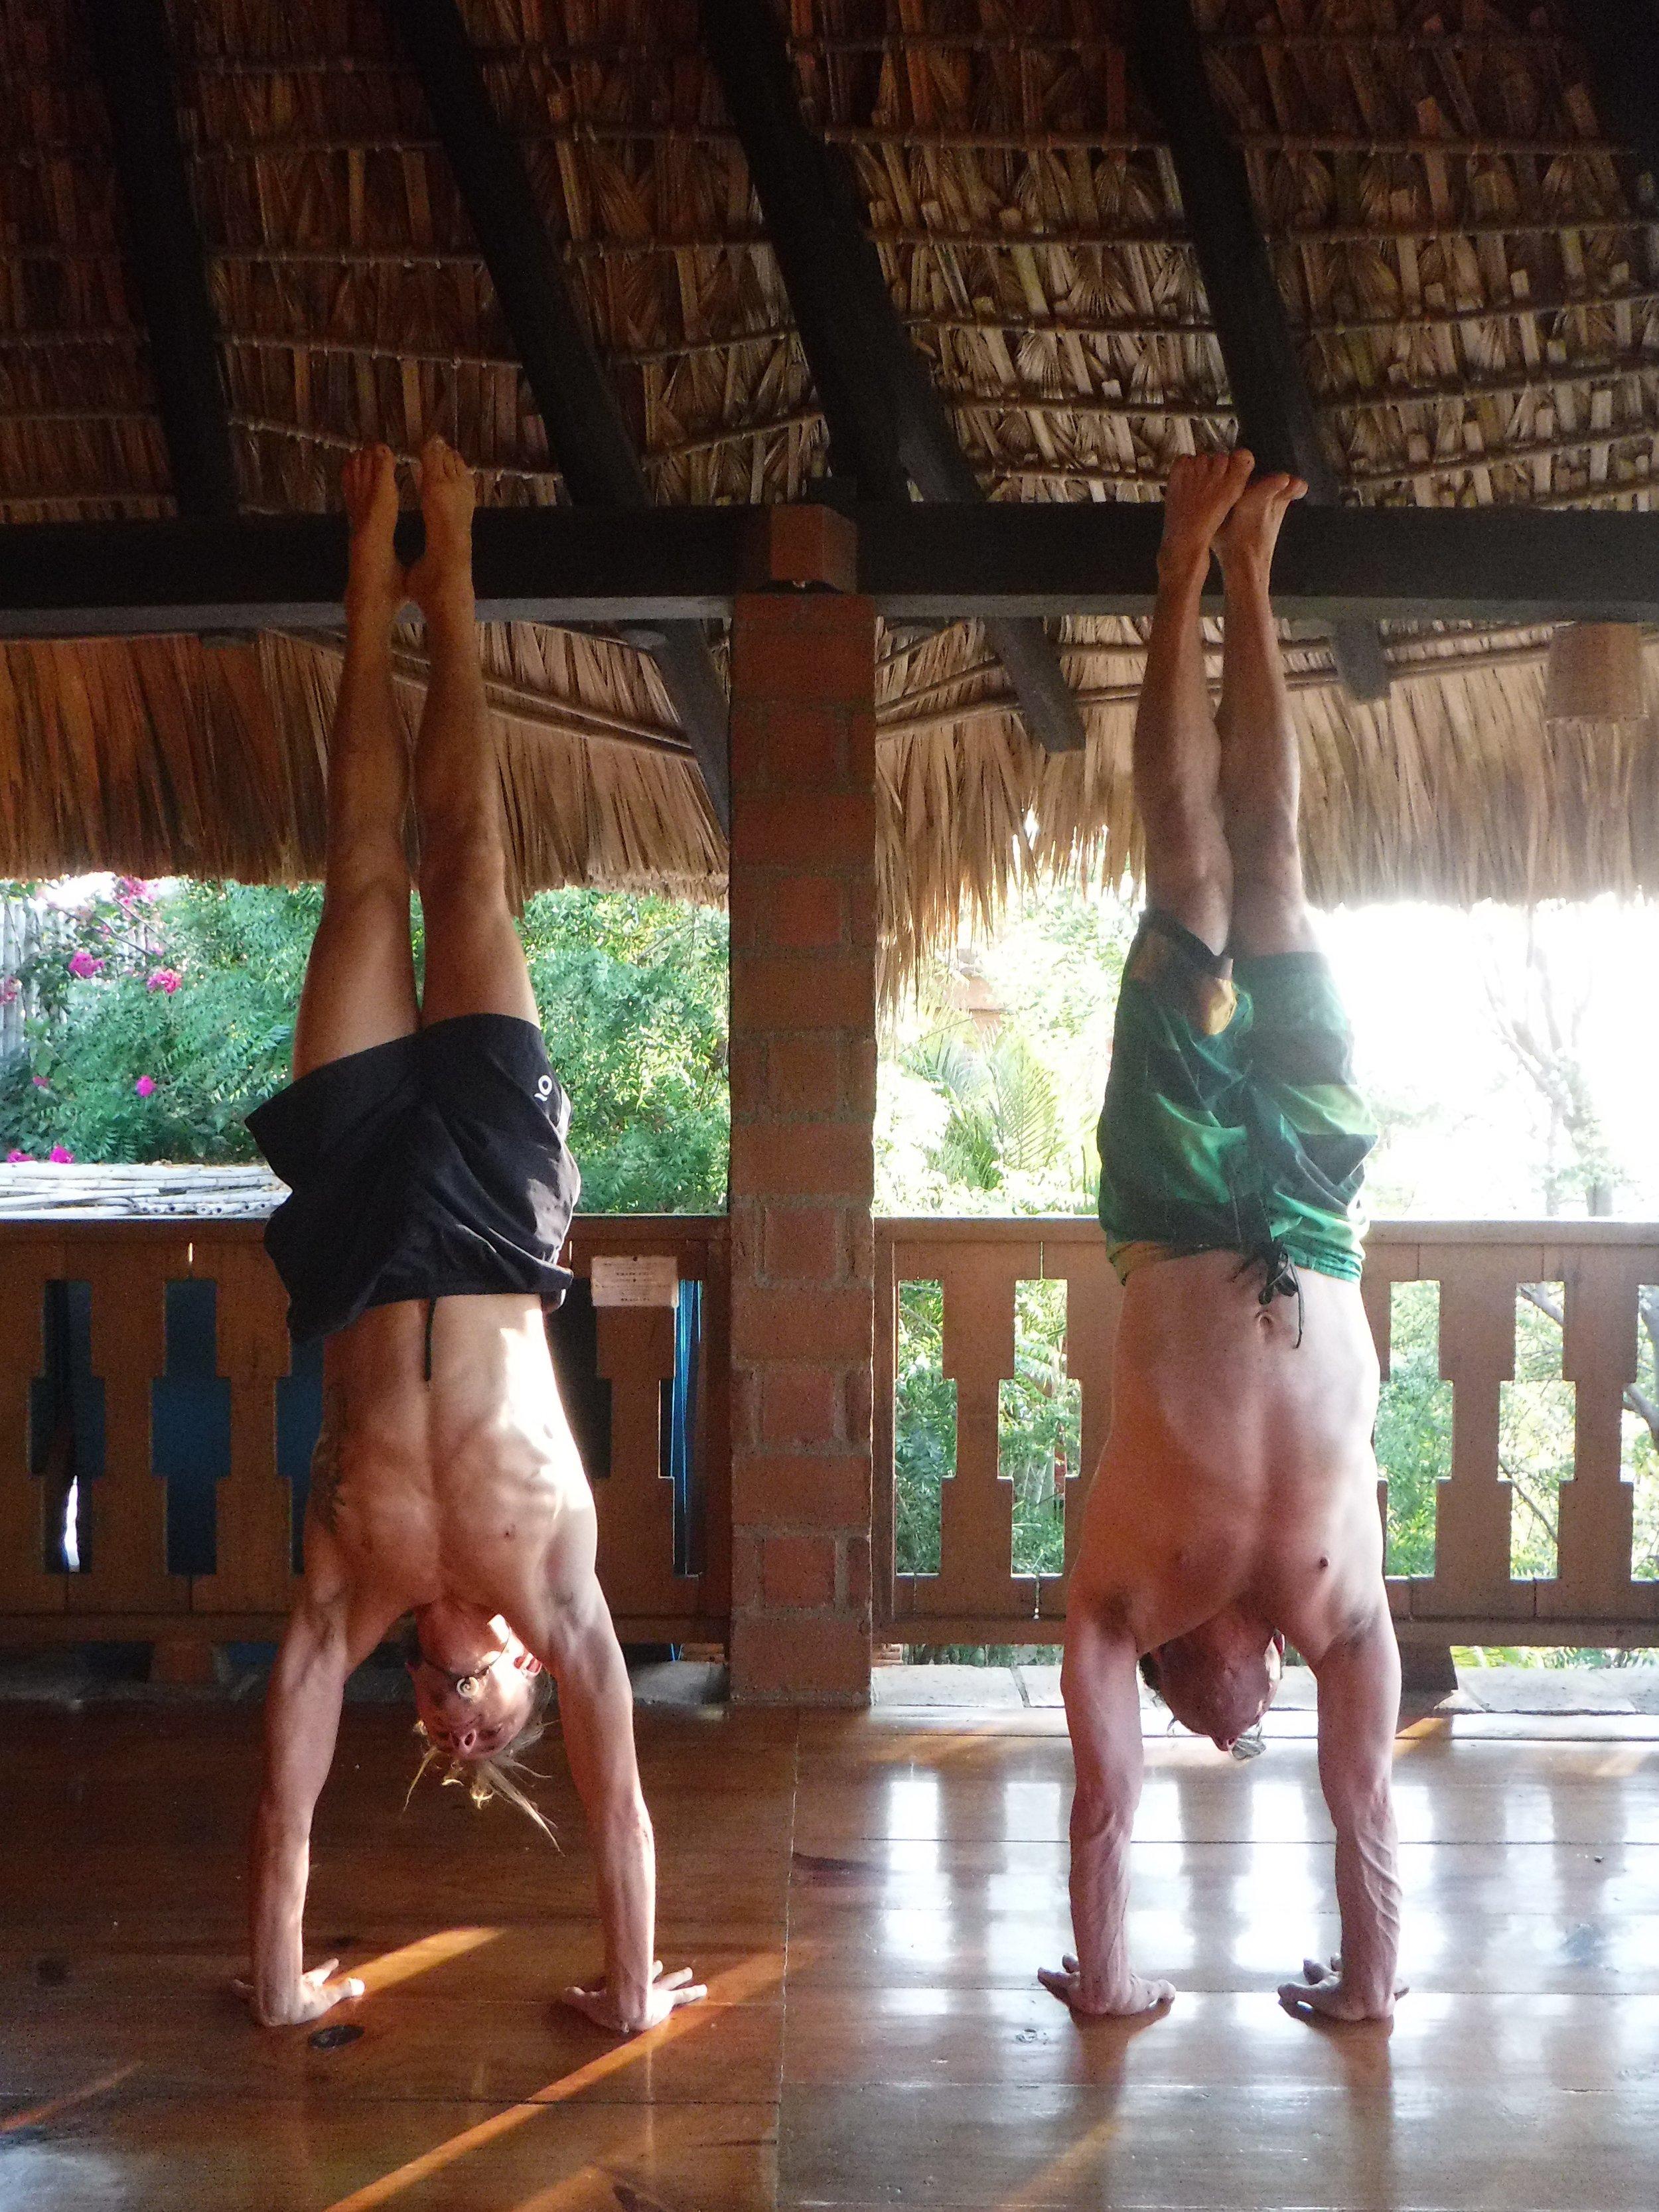 yogastef fernando trejo handstands on retreat in Mexico 2017.jpg